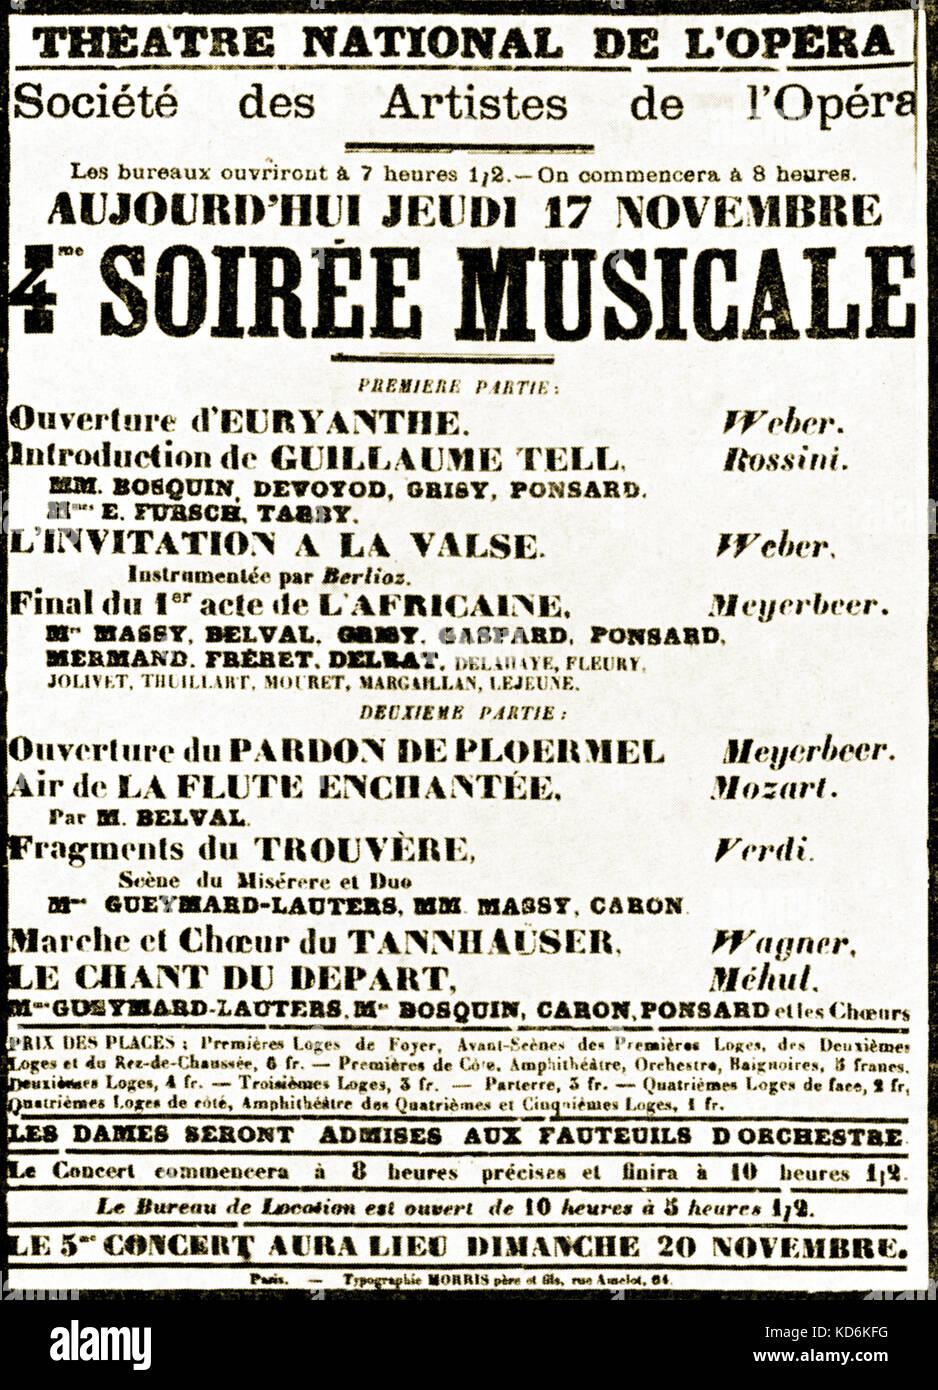 Parisian Opera Poster from 17th November 1870 Théâtre National de l'Opéra.  Société - Stock Image